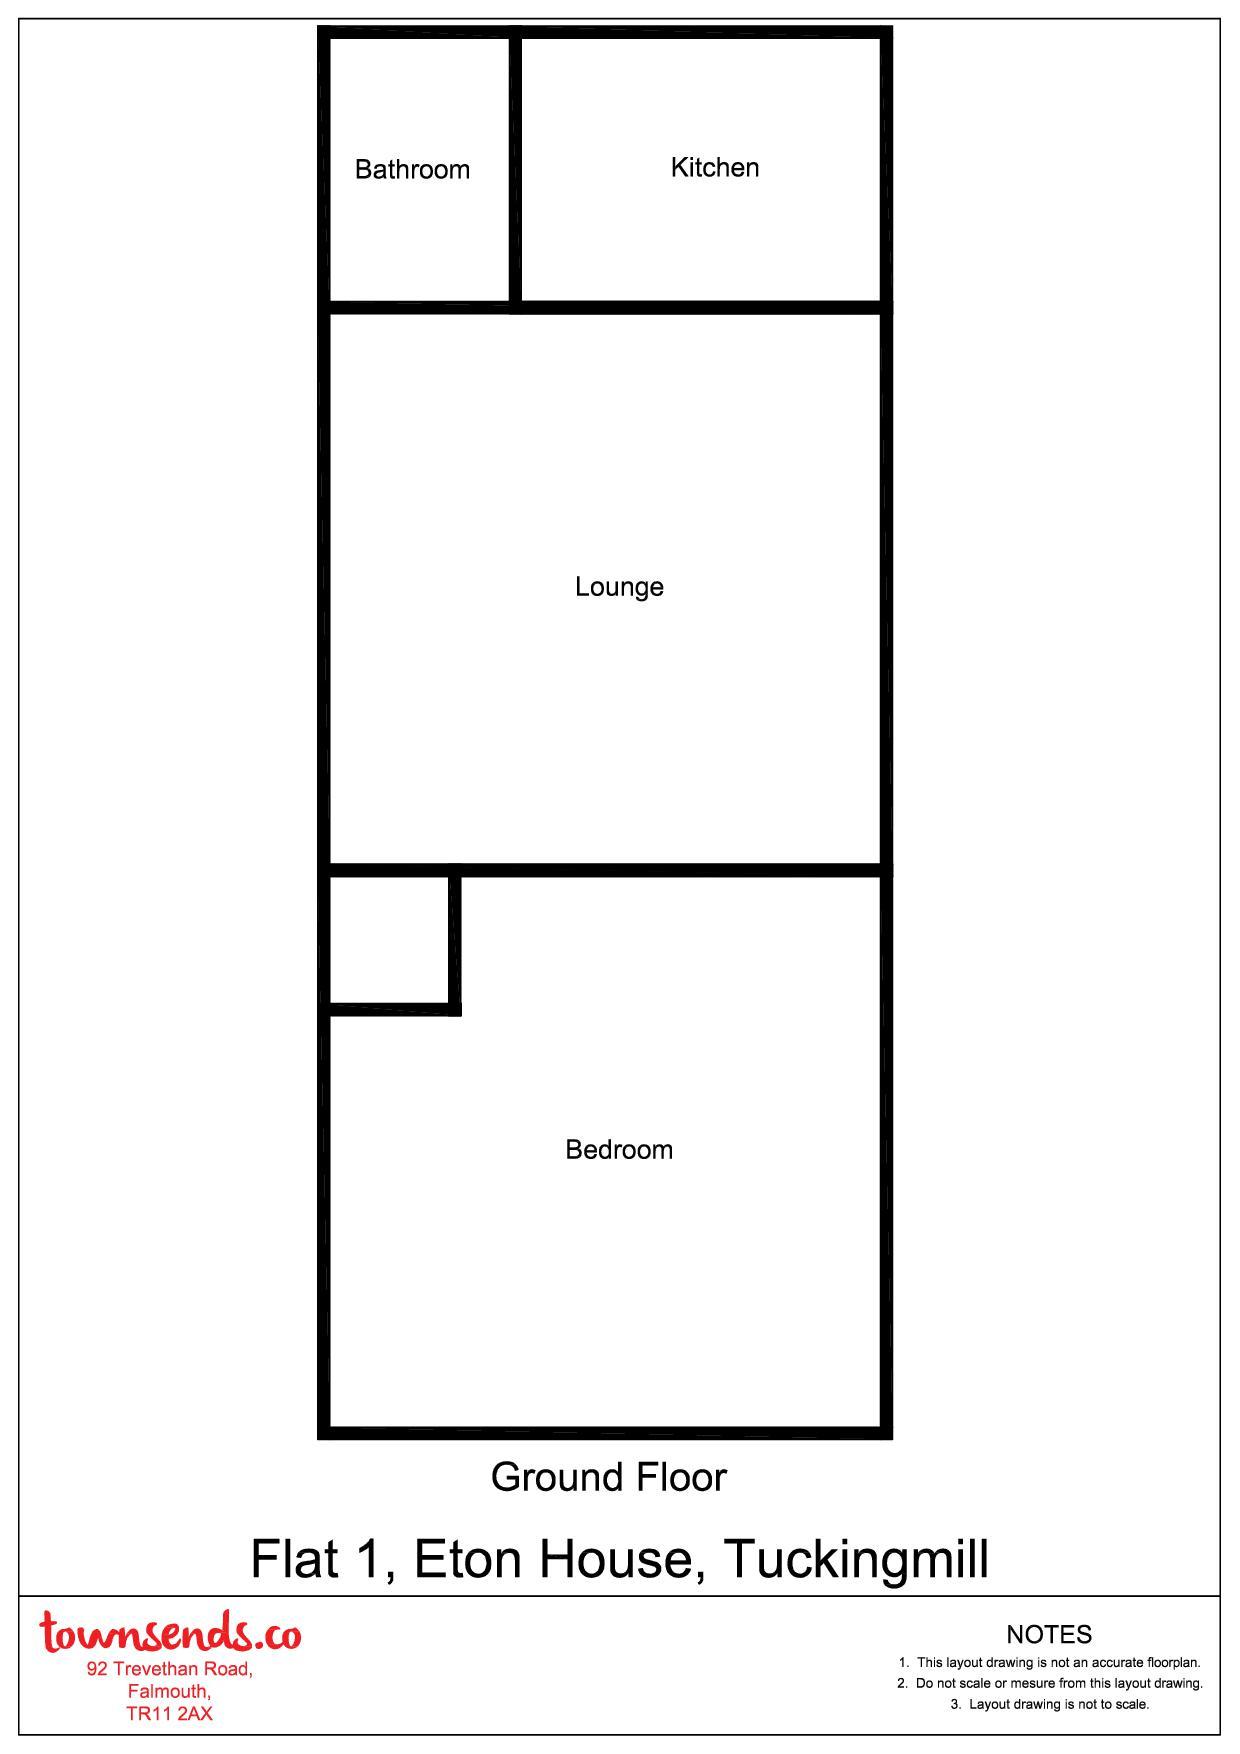 Floorplan: Basic Layout